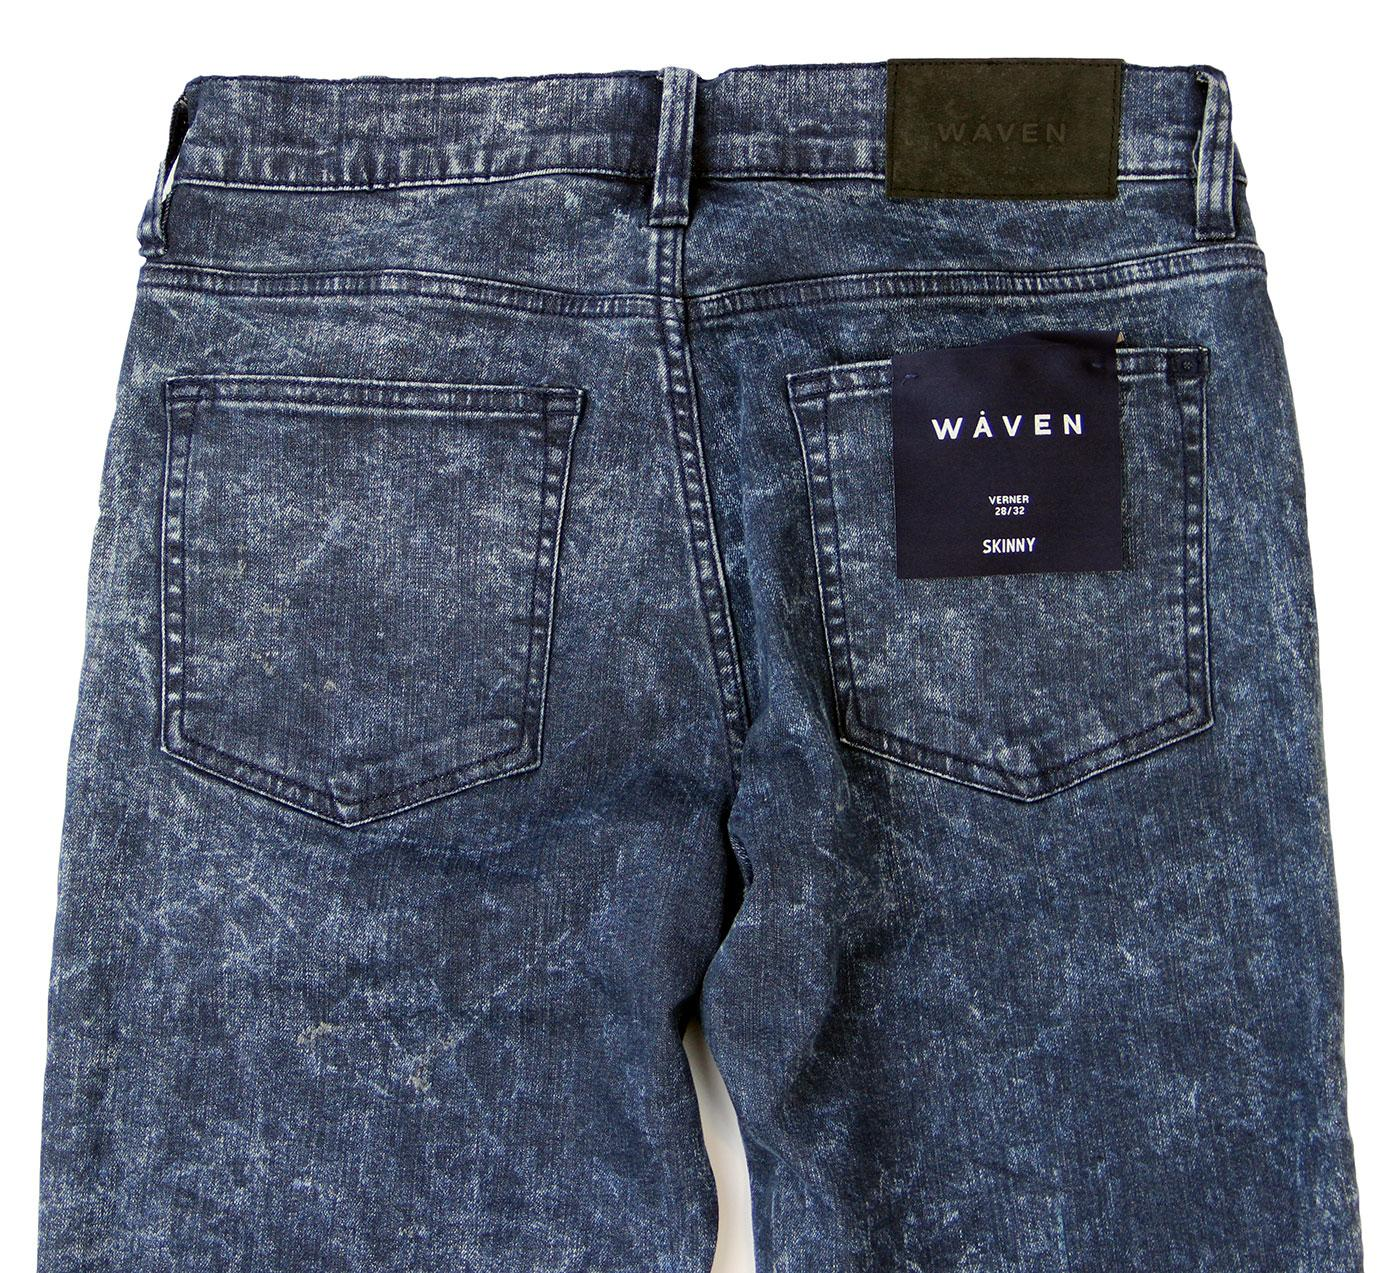 0375c832 WAVEN Verner Retro Indie 70s Skinny Denim Jeans Acid Wash Blue